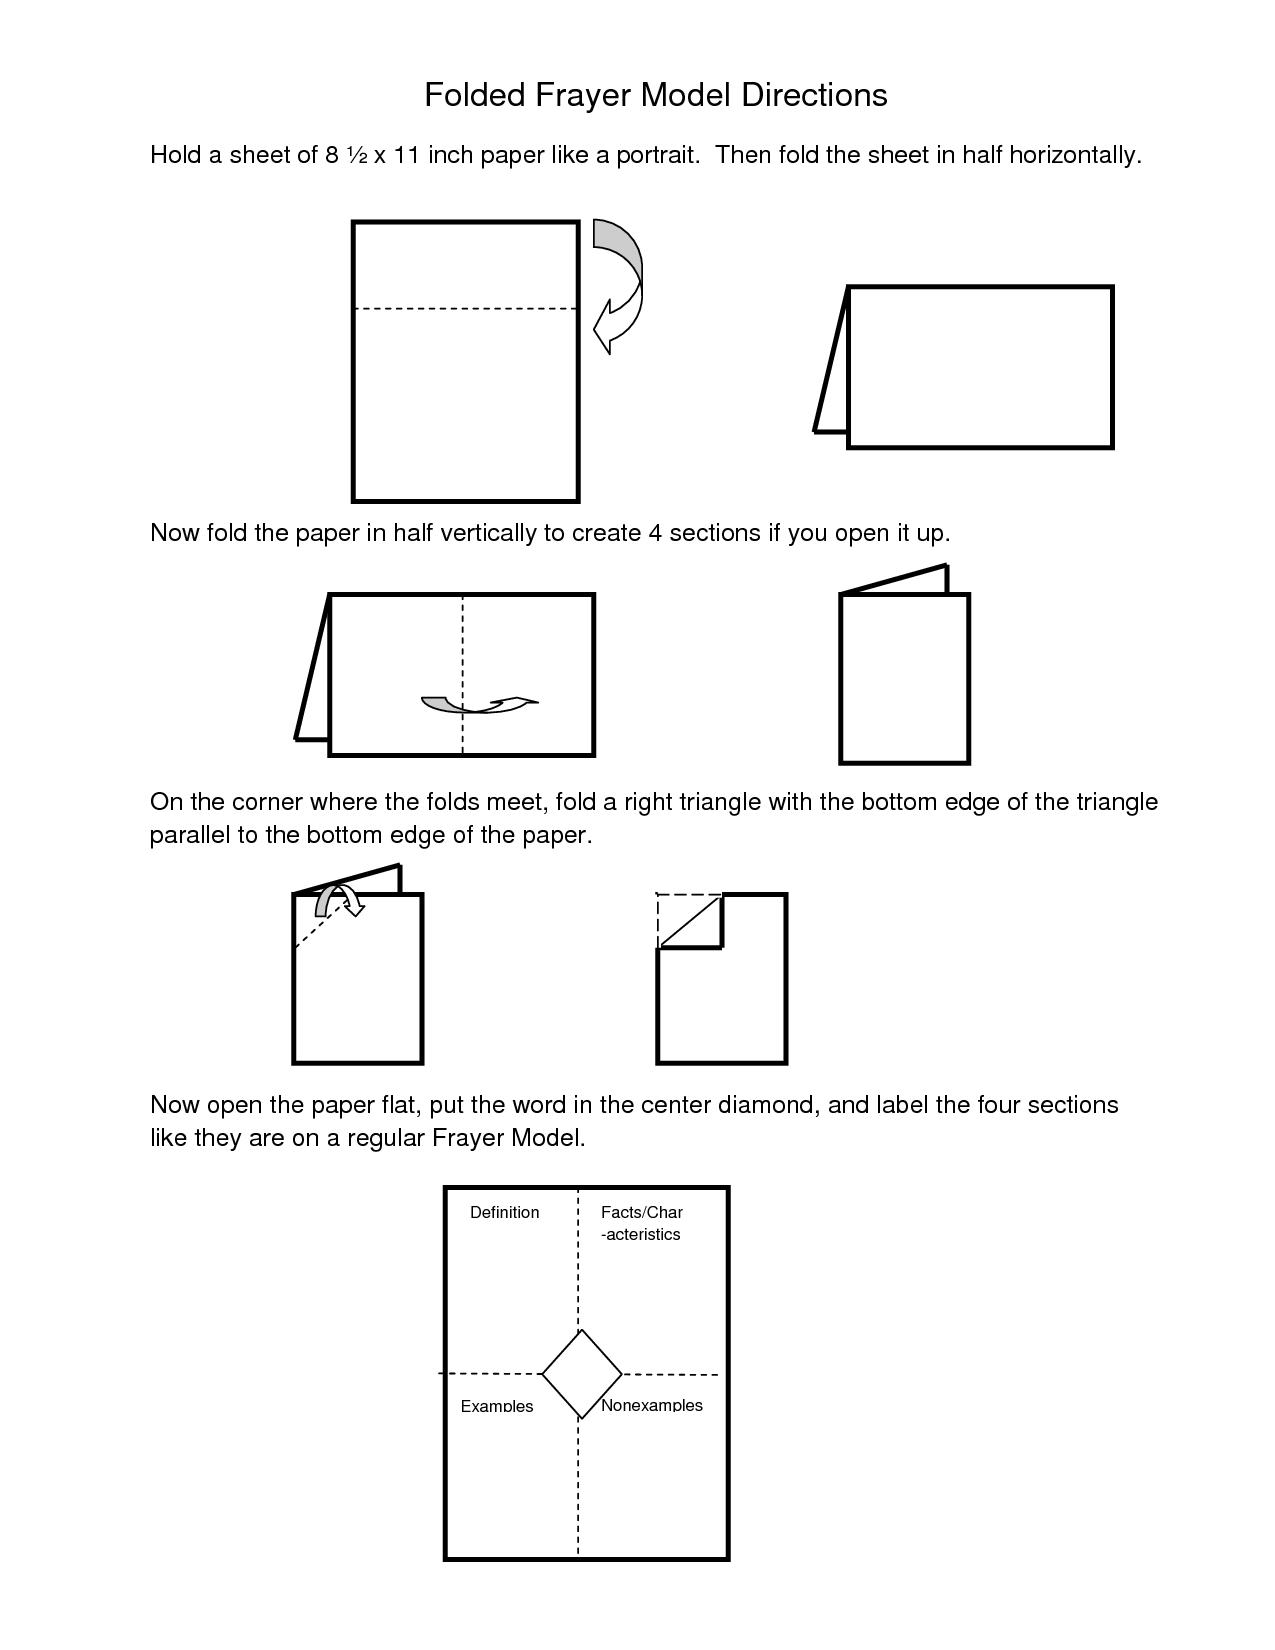 frayer model template word directions for folded frayer model sau 64 [ 1275 x 1650 Pixel ]